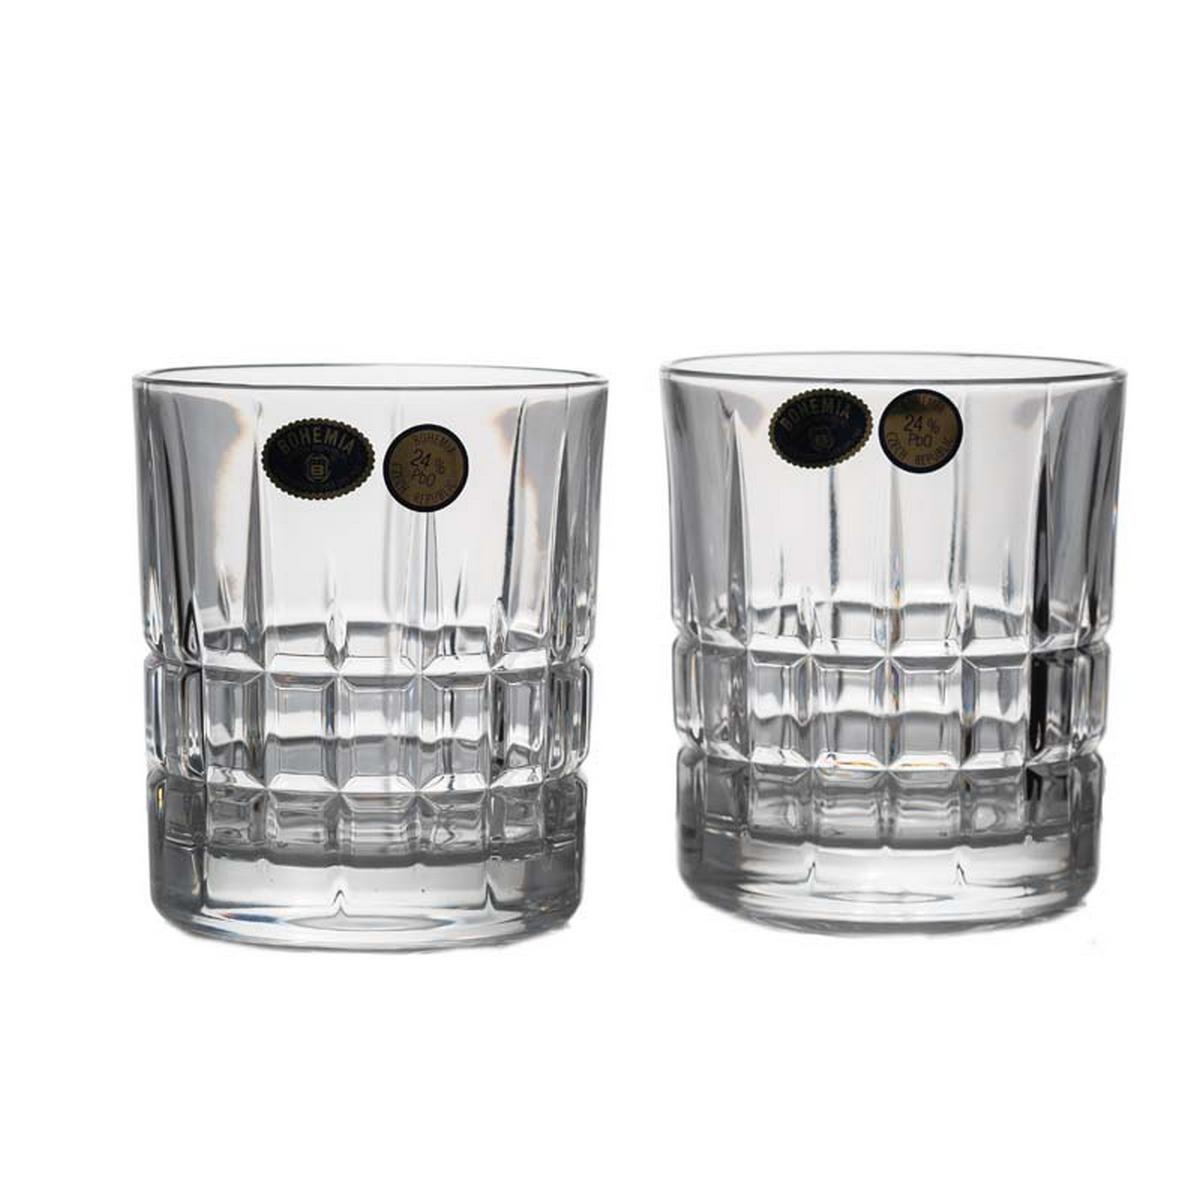 London Set 6 Pahare Cristal Bohemia Whisky 320 Ml 2021 aranjareamesei.ro